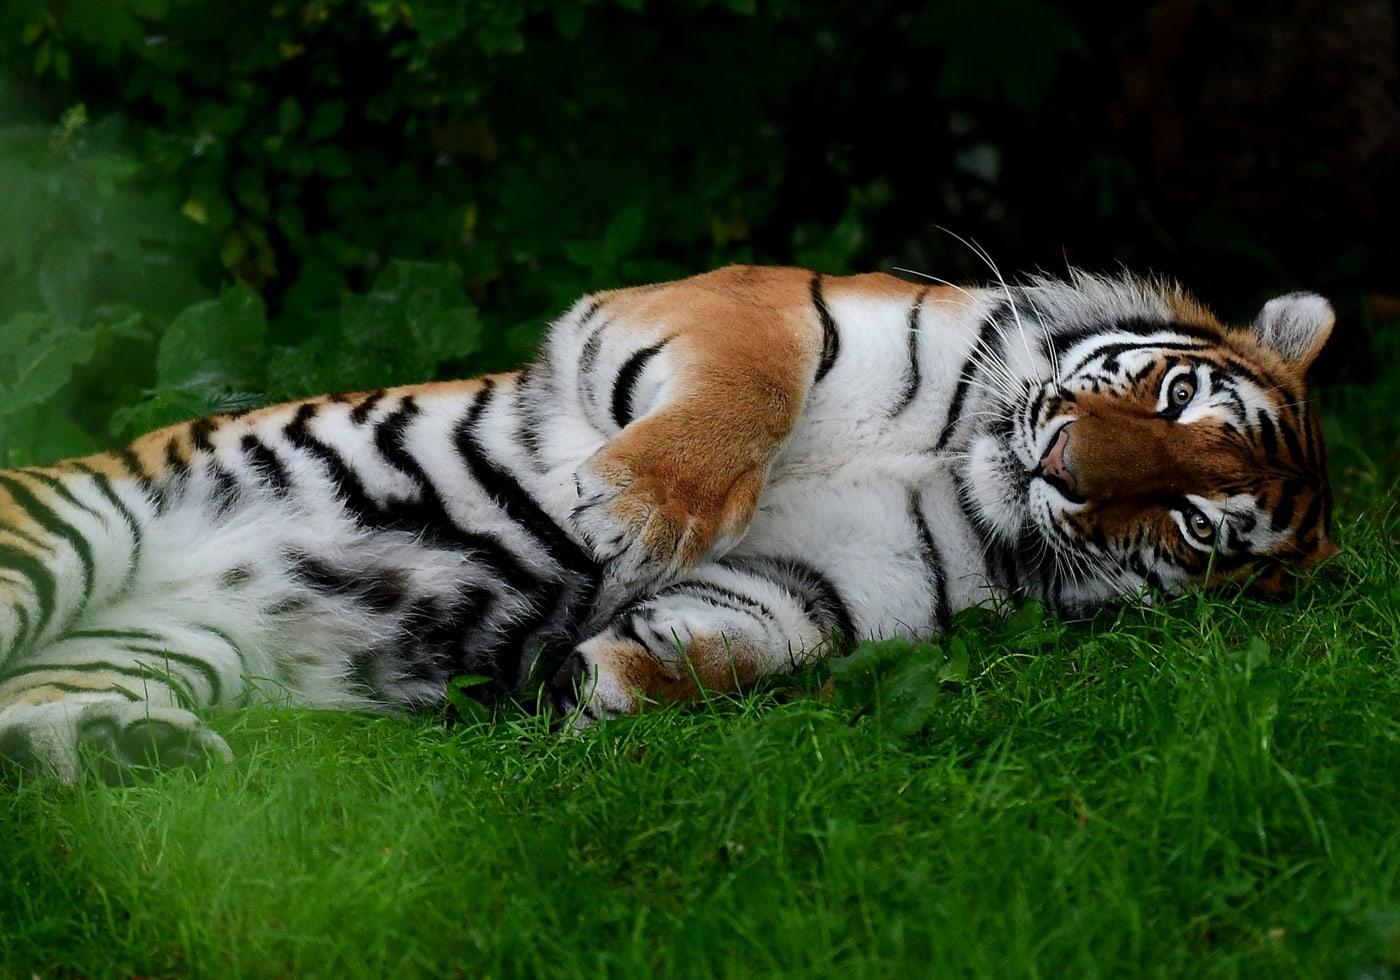 Sommerausflug mit Kindern in den Tierpark Hellabrunn München: Dösender Tiger // HIMBEER